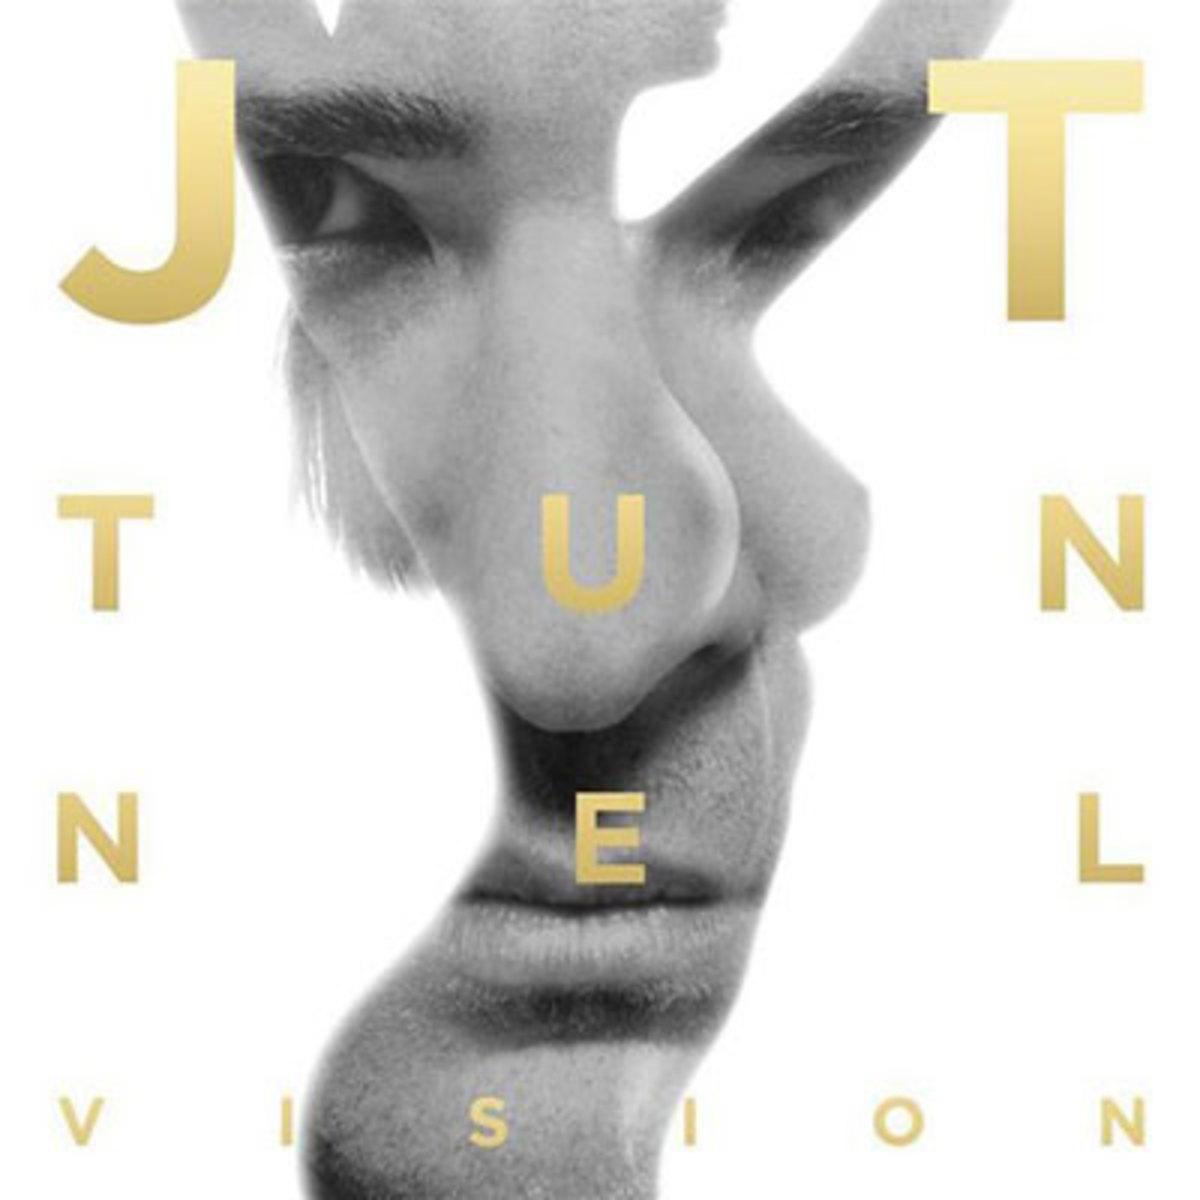 jt-tunnelvision.jpg